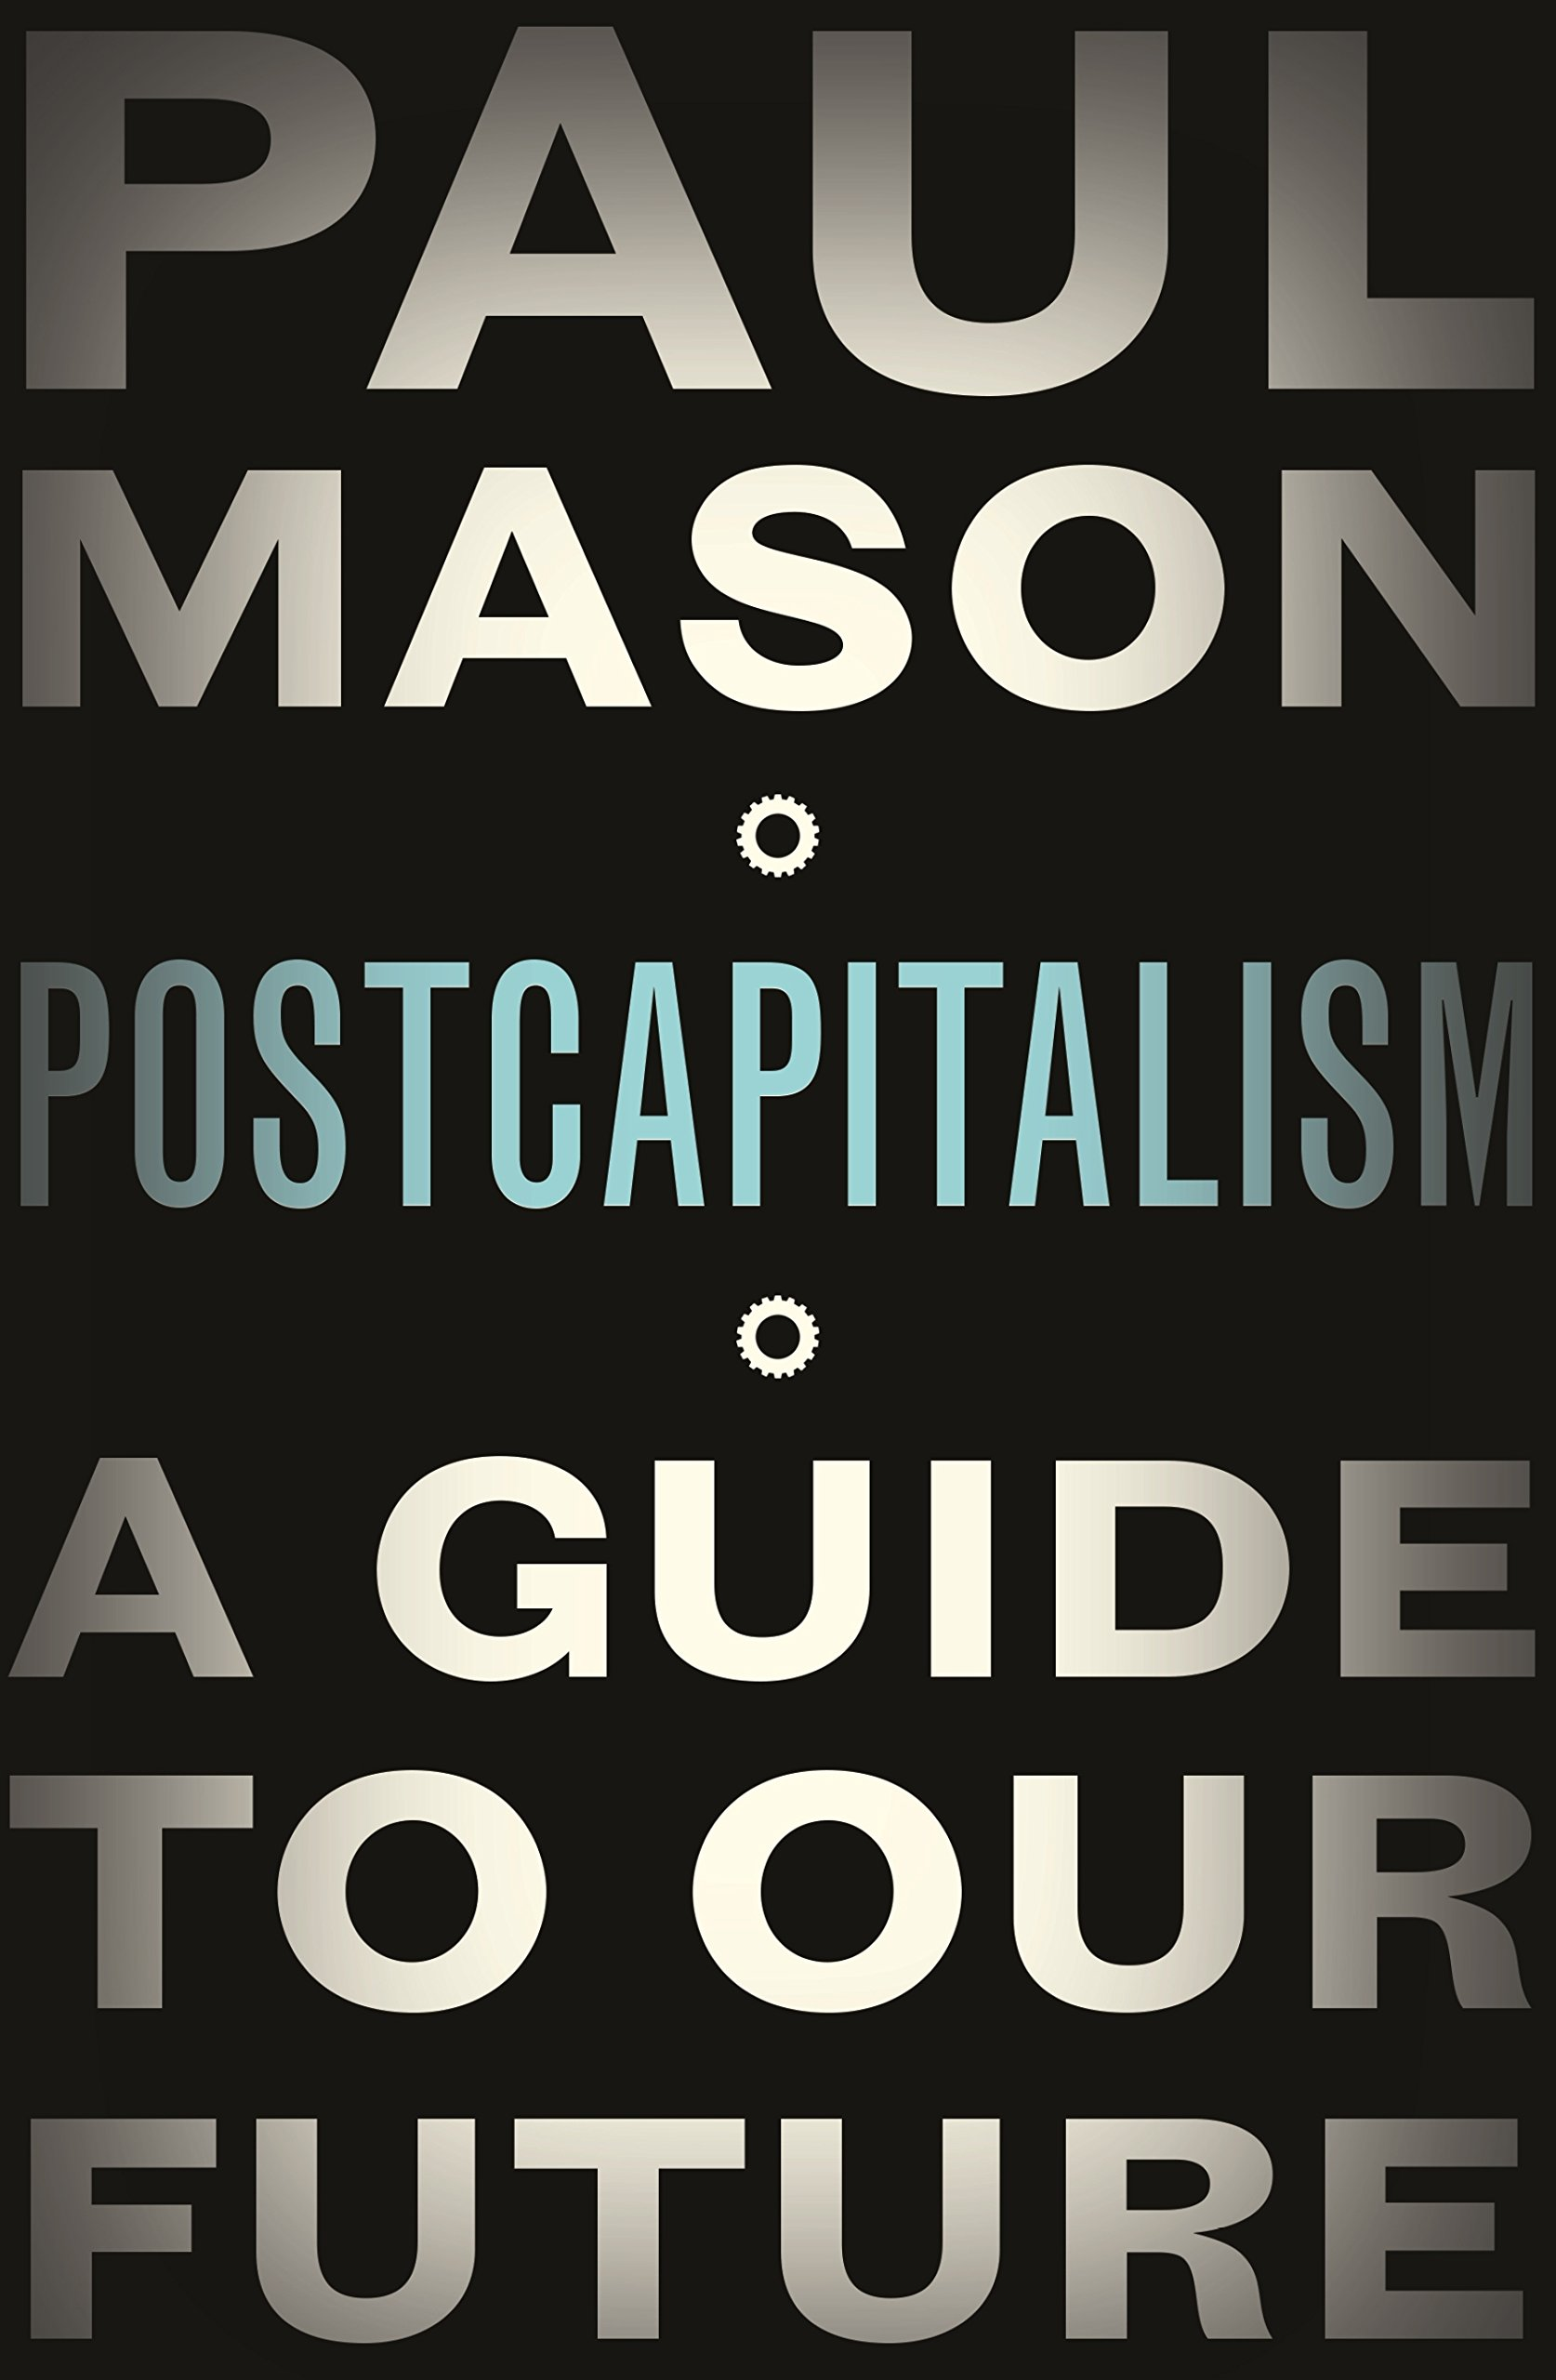 PostCapitalism: A Guide to Our Future: Amazon.de: Paul Mason ...